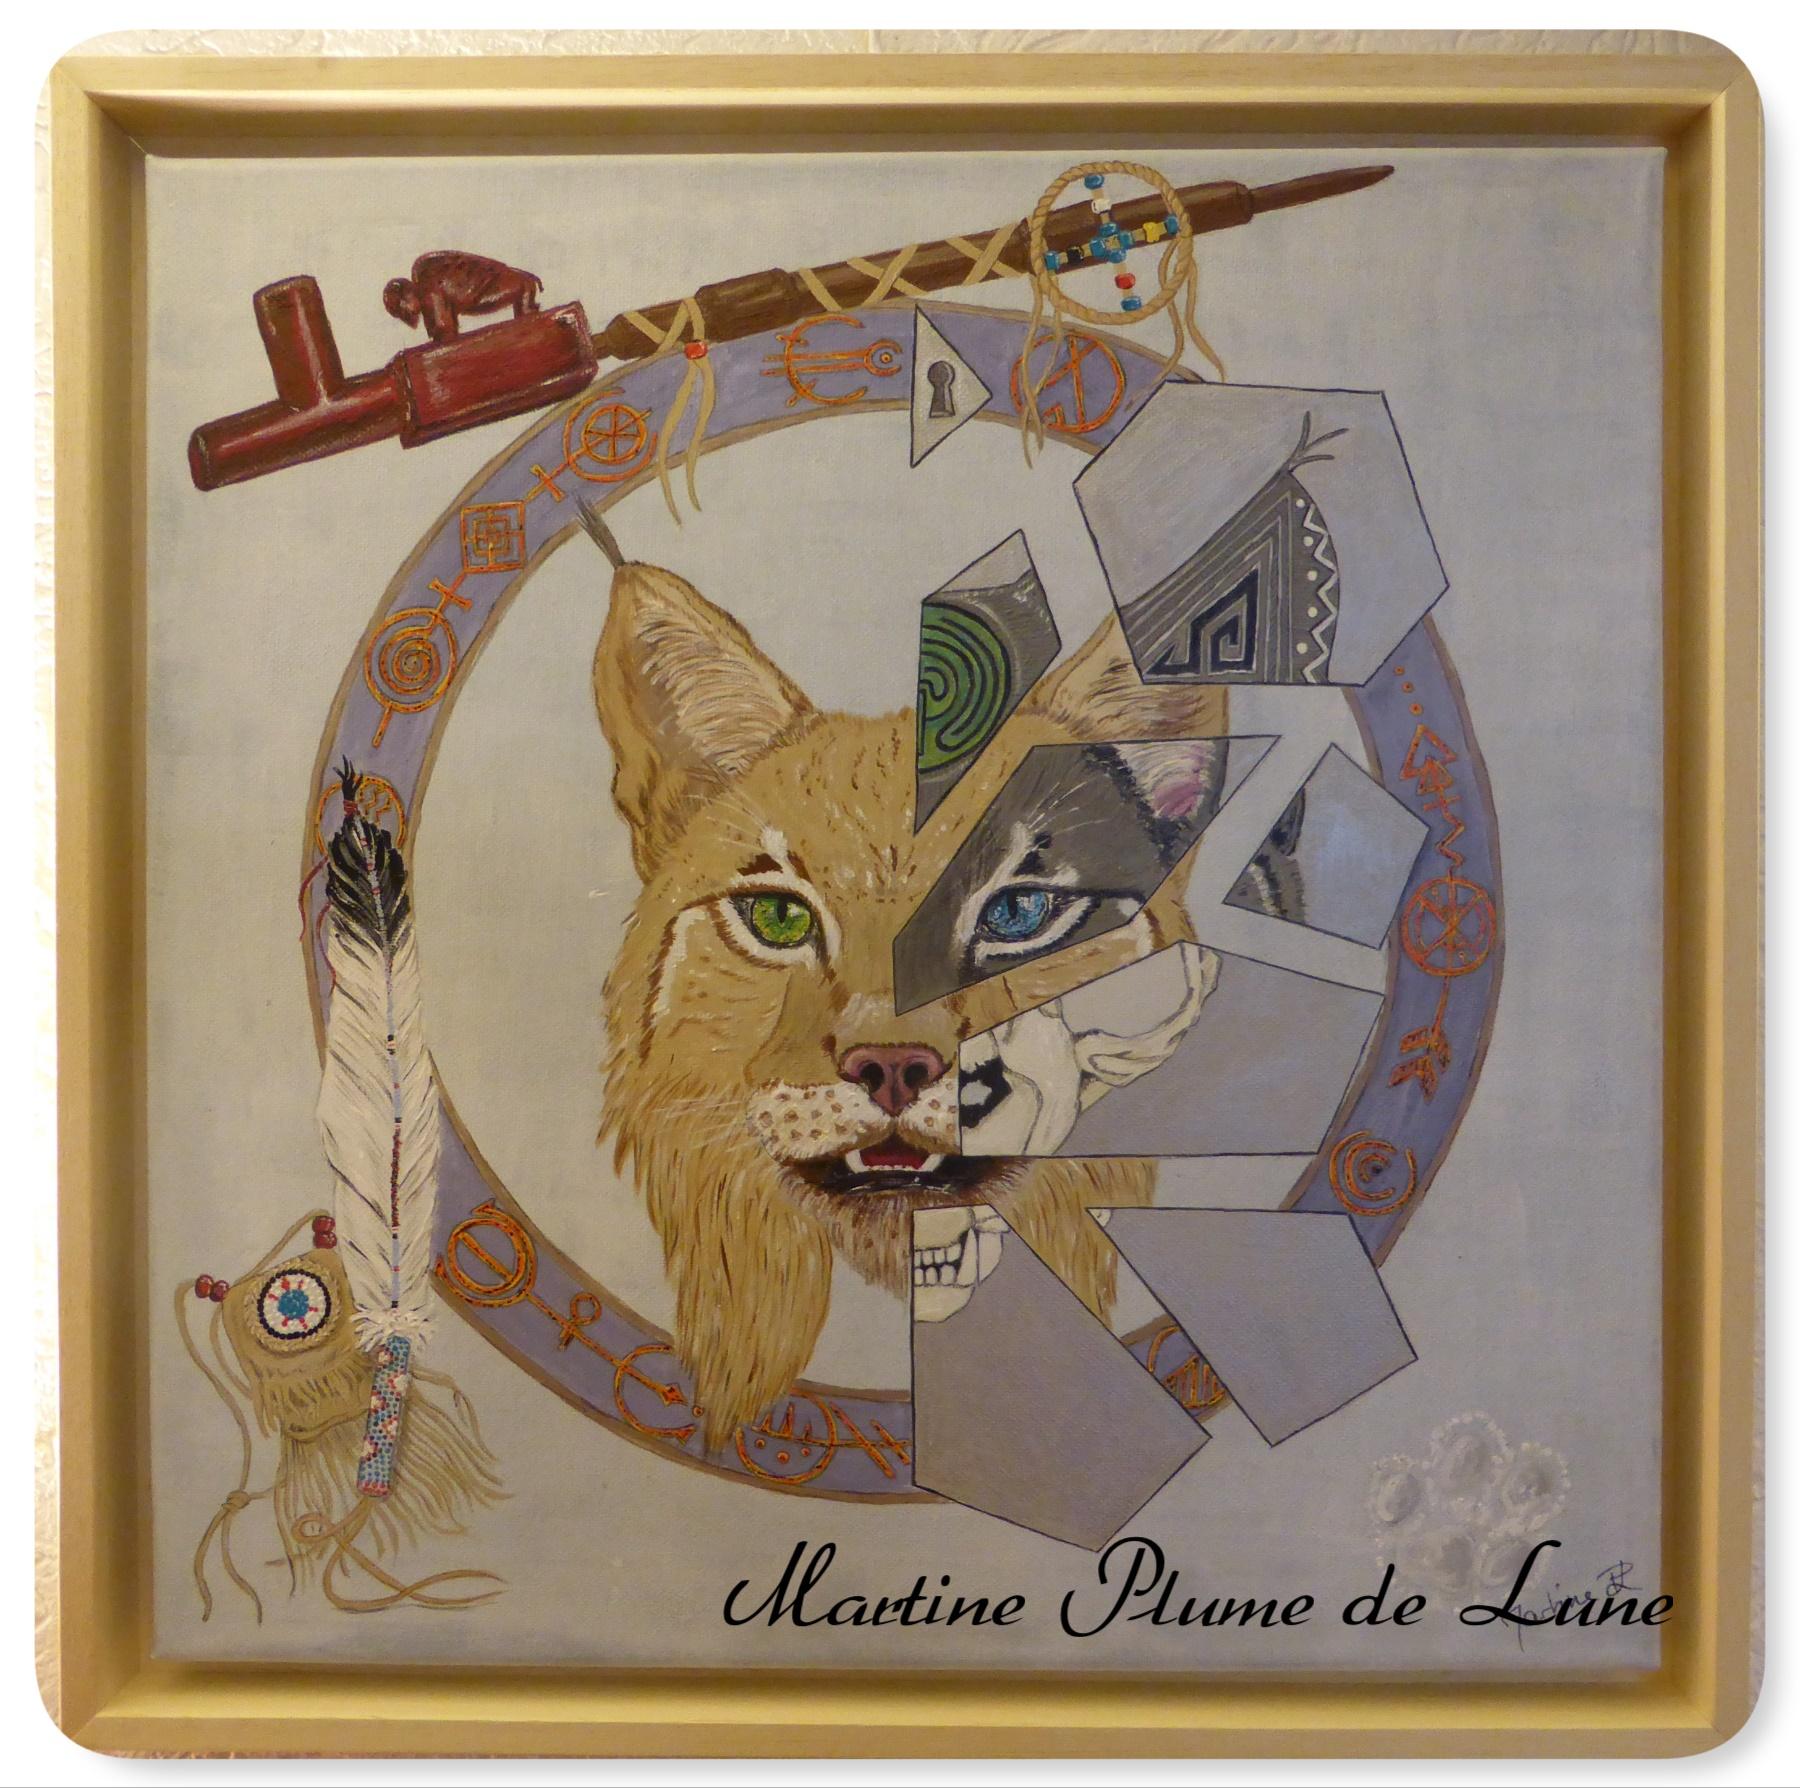 Frère Lynx